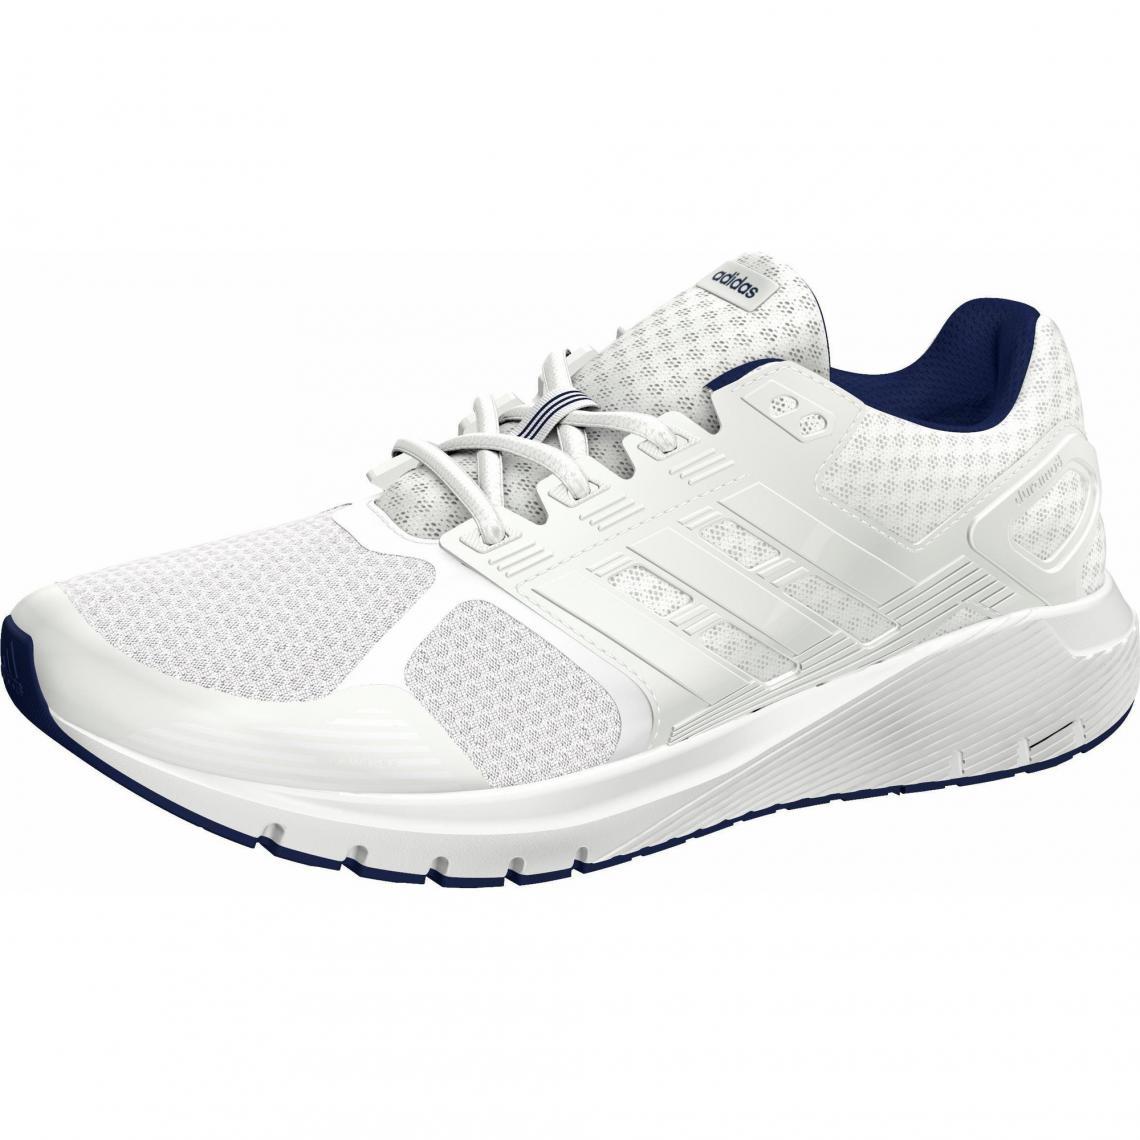 adidas Performance Duramo 8 chaussures de running femme Blanc